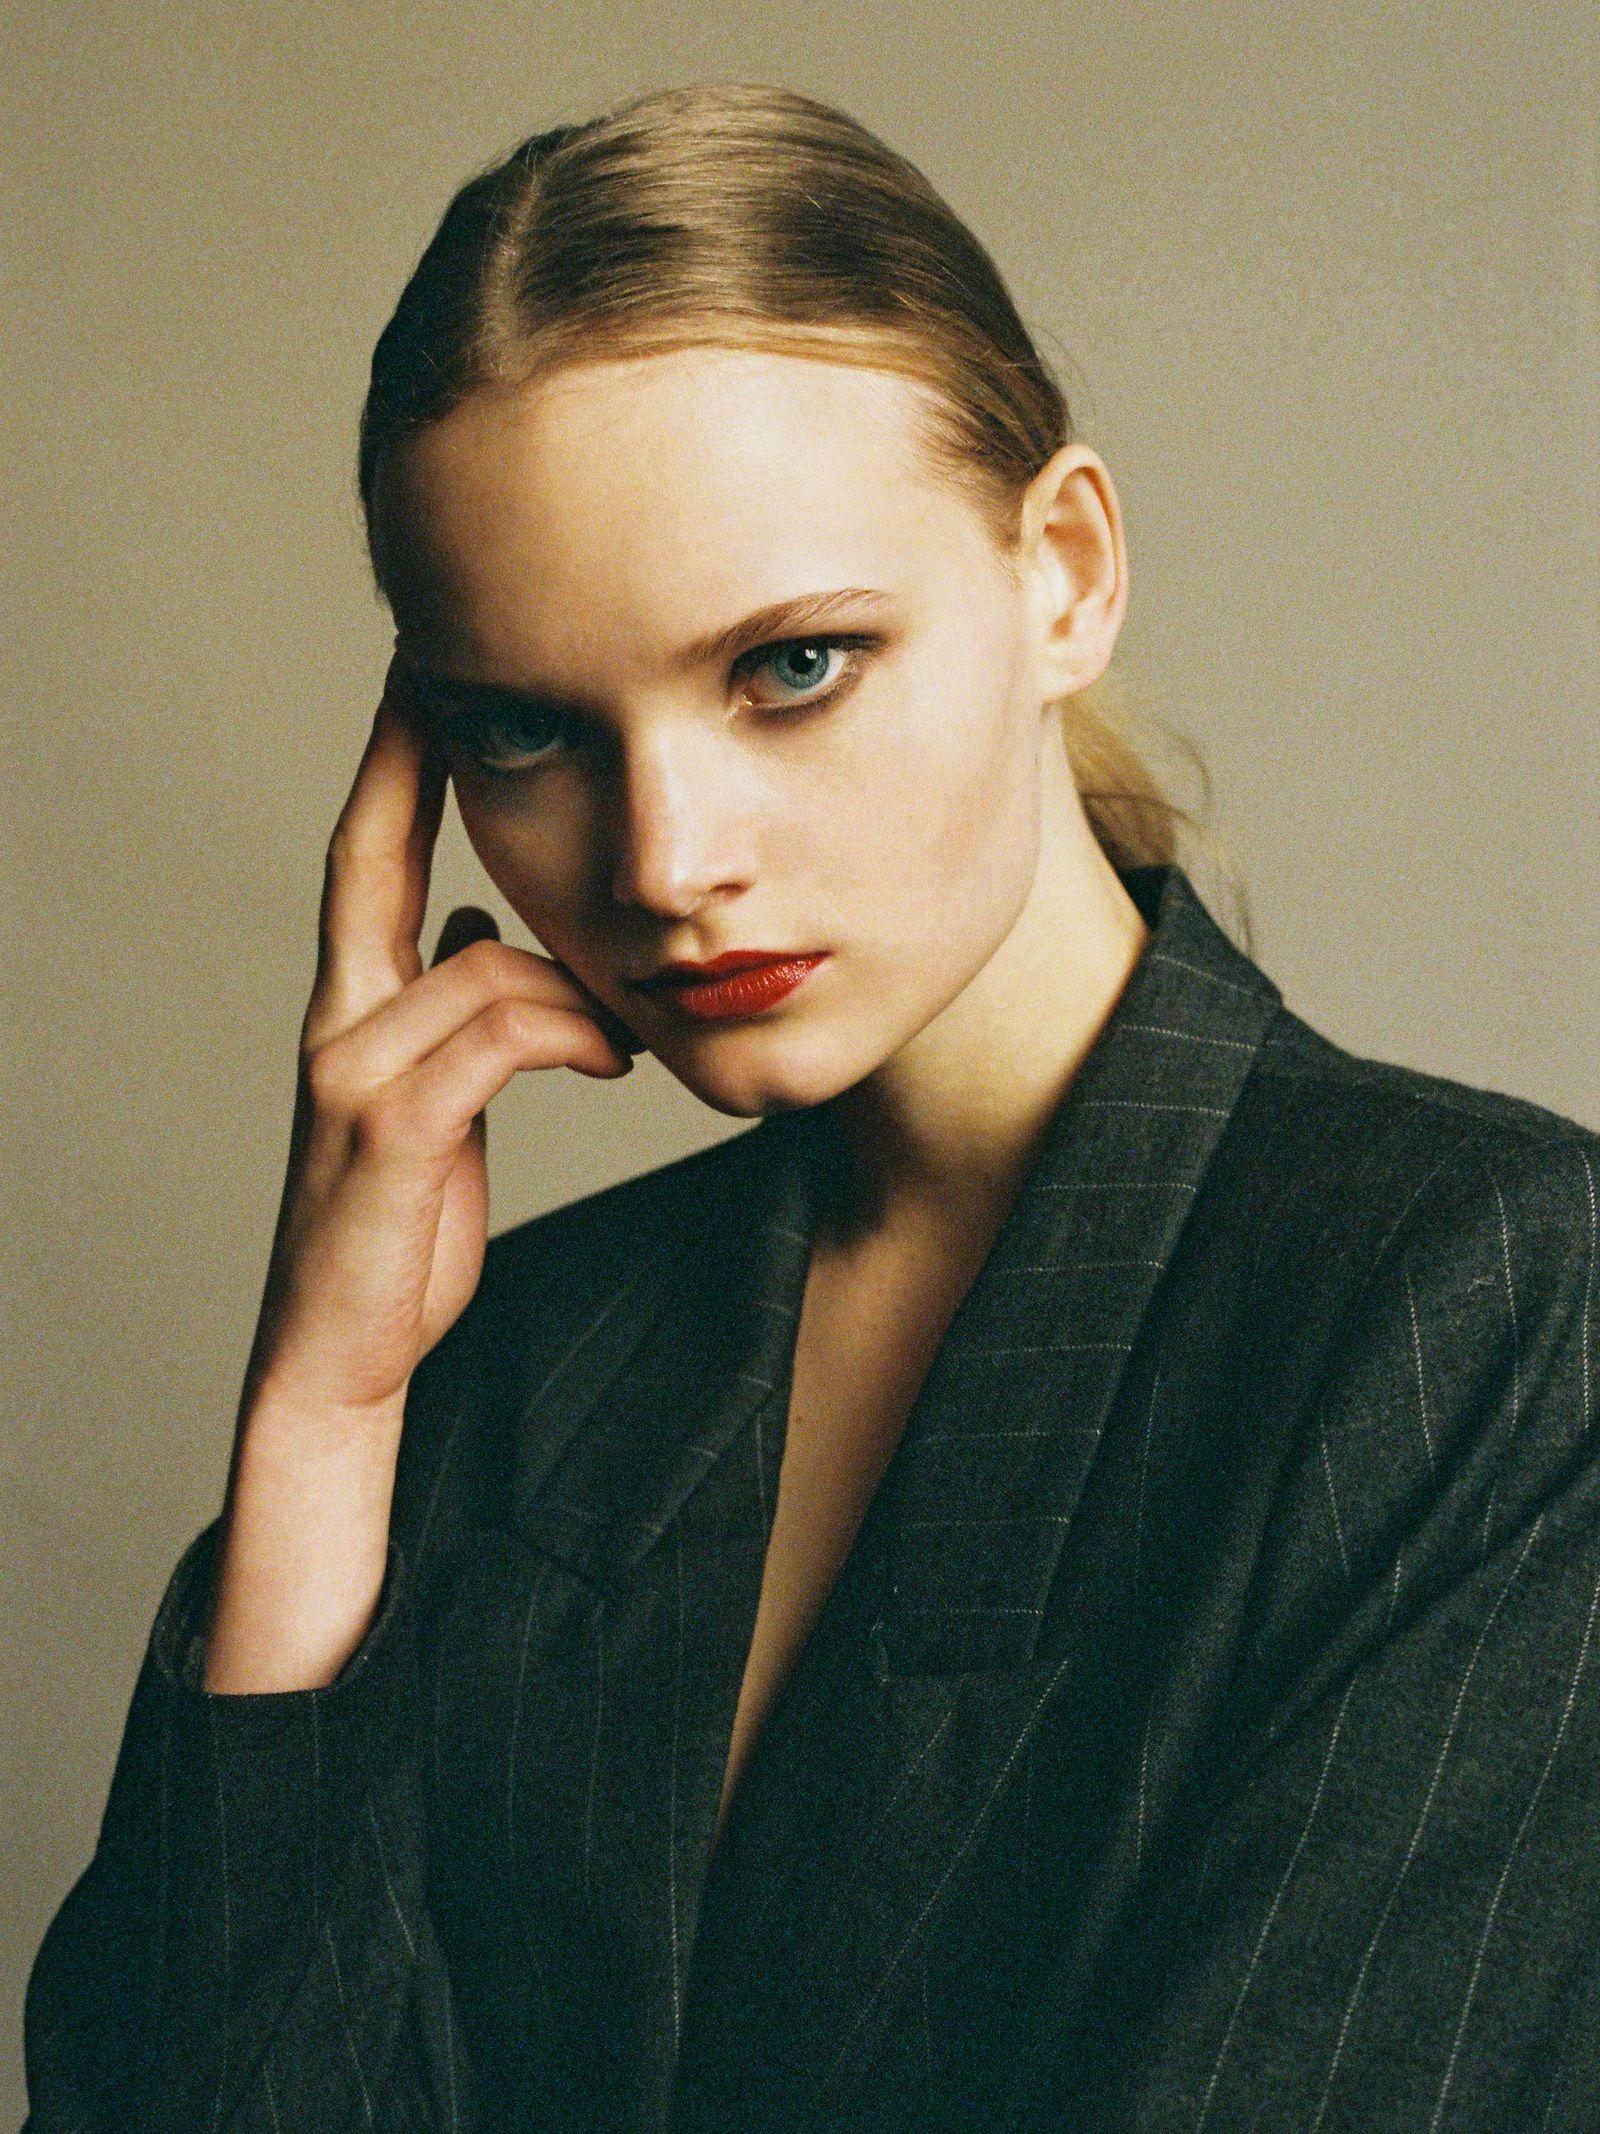 BEAUTY Claire Plekhoff / Makeup artist based in Paris (с